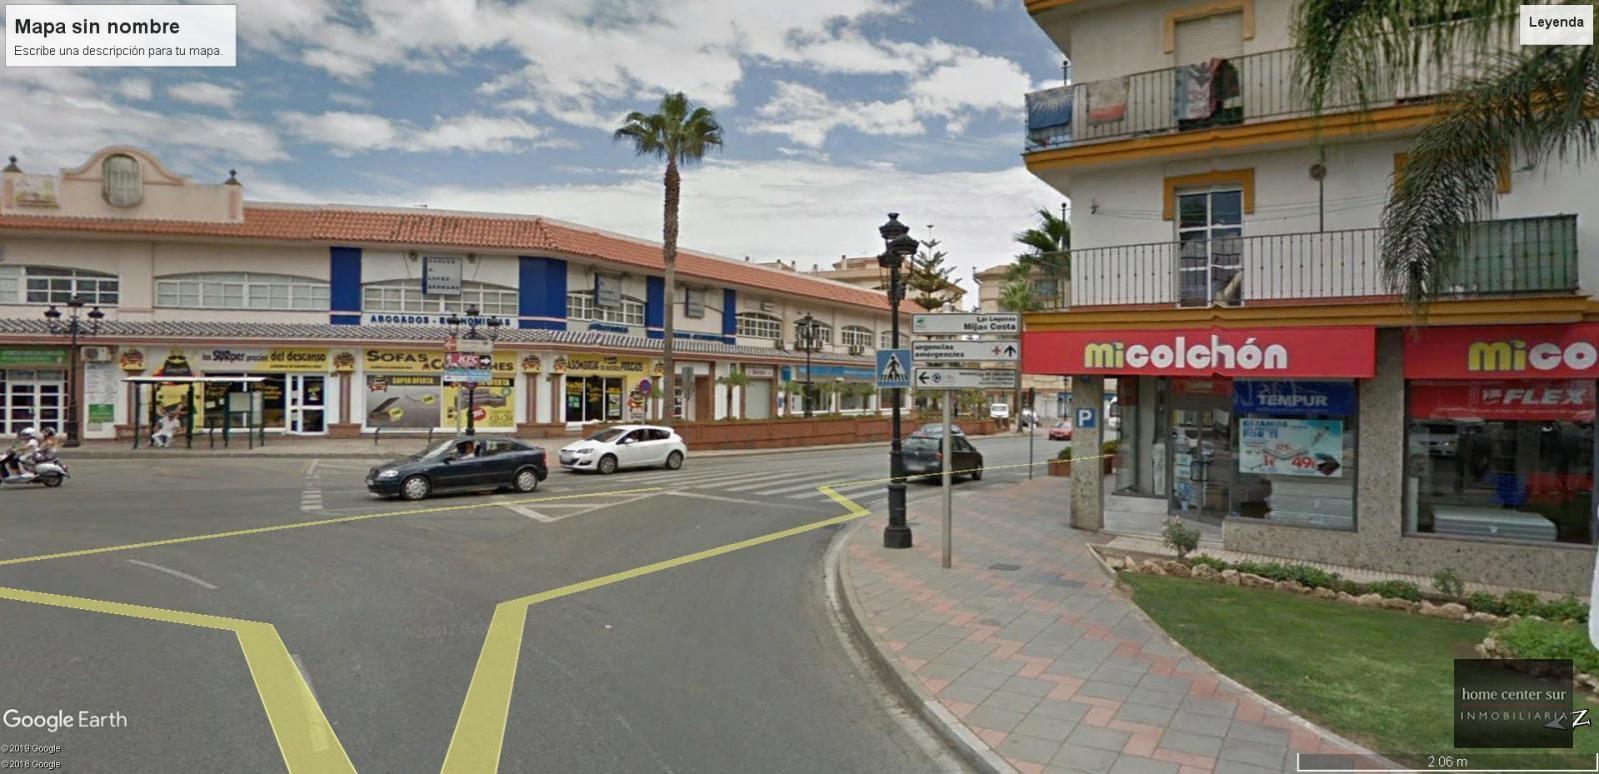 Local en alquiler en Avenida de Mijas unde (Fuengirola), 3.500 €/mes